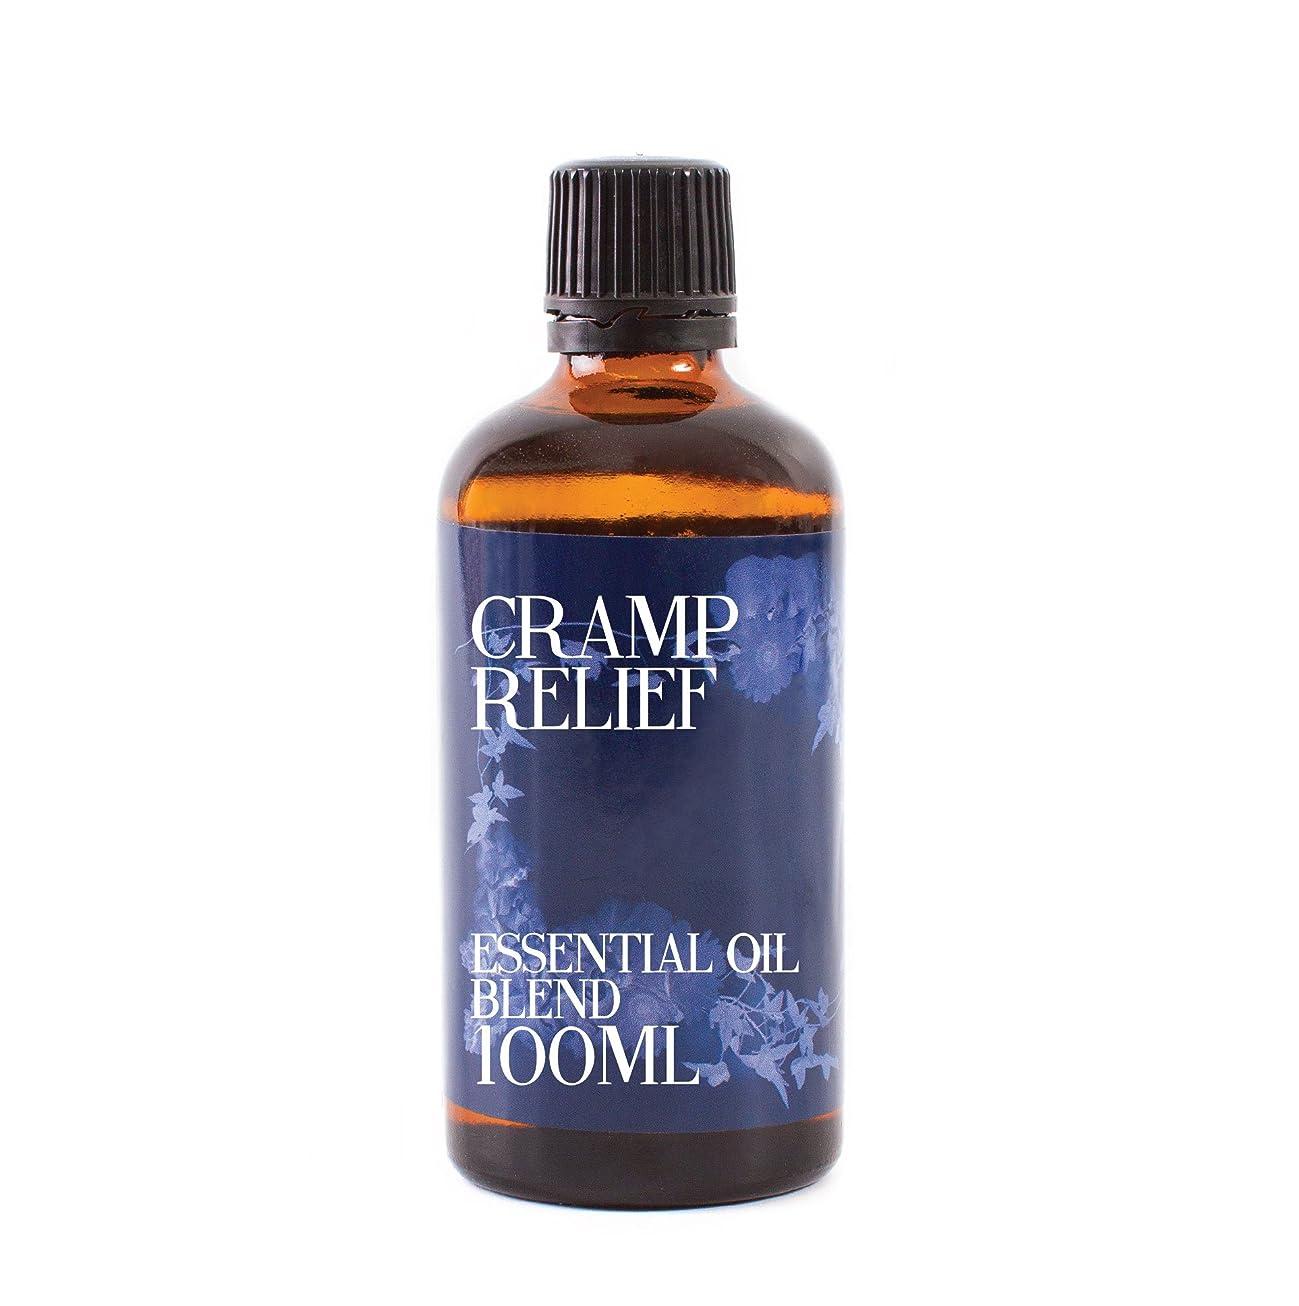 計画神経障害食事Mystix London | Cramp Relief Essential Oil Blend - 100ml - 100% Pure